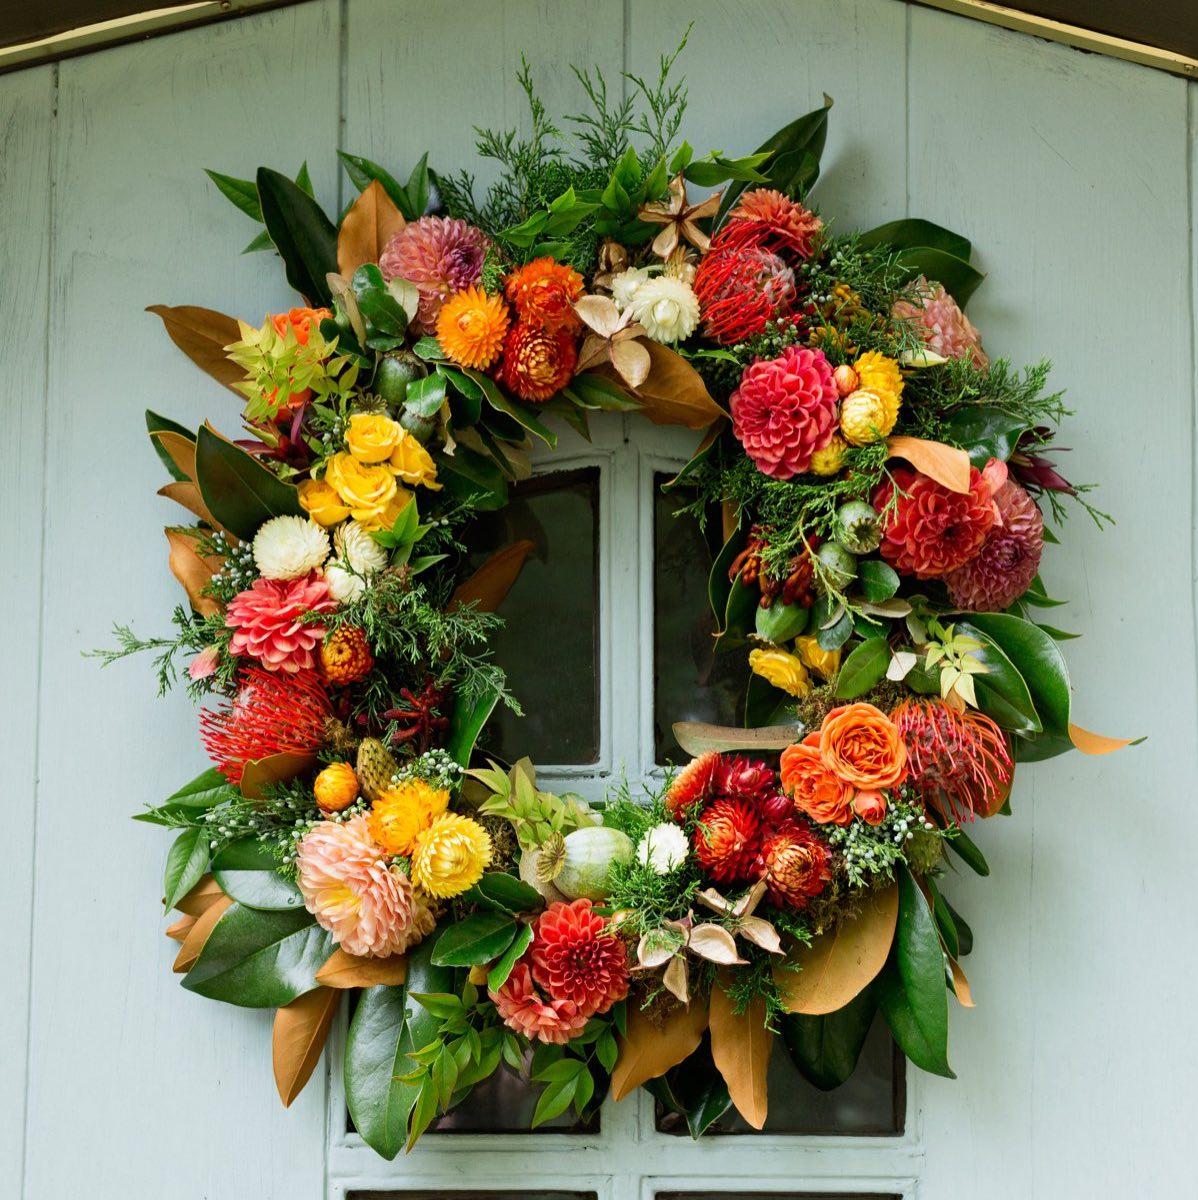 Karin Woodward - How To Make A Fall Wreath